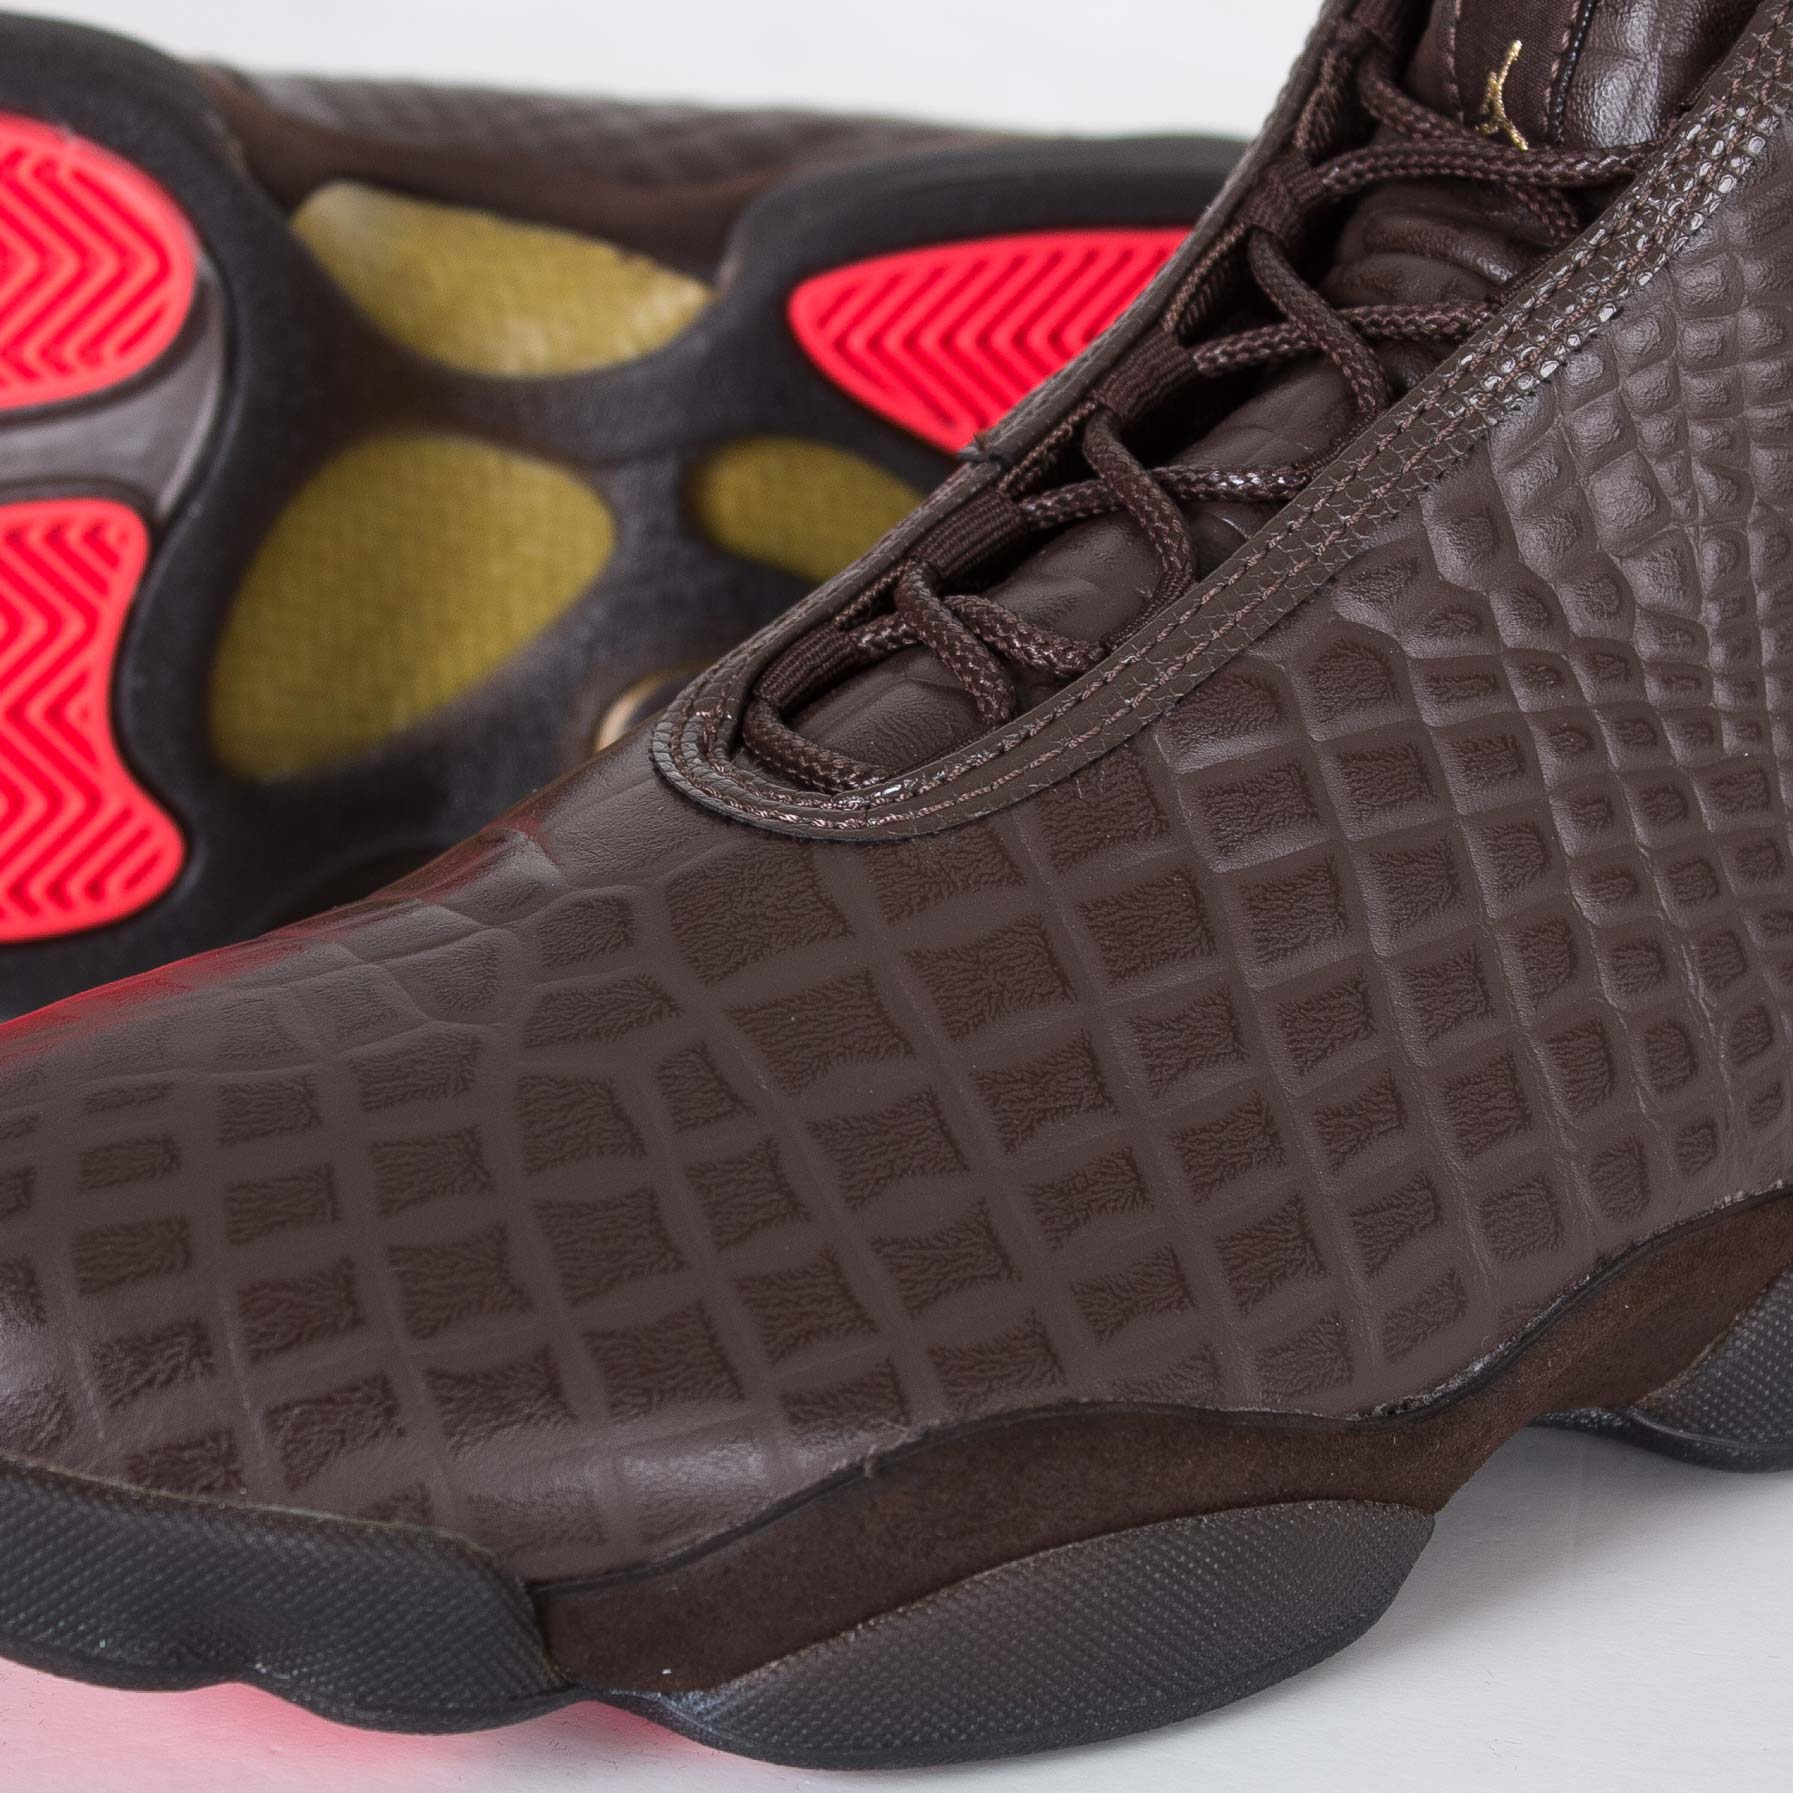 1de78fdb546 Jordan Brand Jordan Horizon Premium - 822333-205 - Sneakersnstuff   sneakers  & streetwear online since 1999